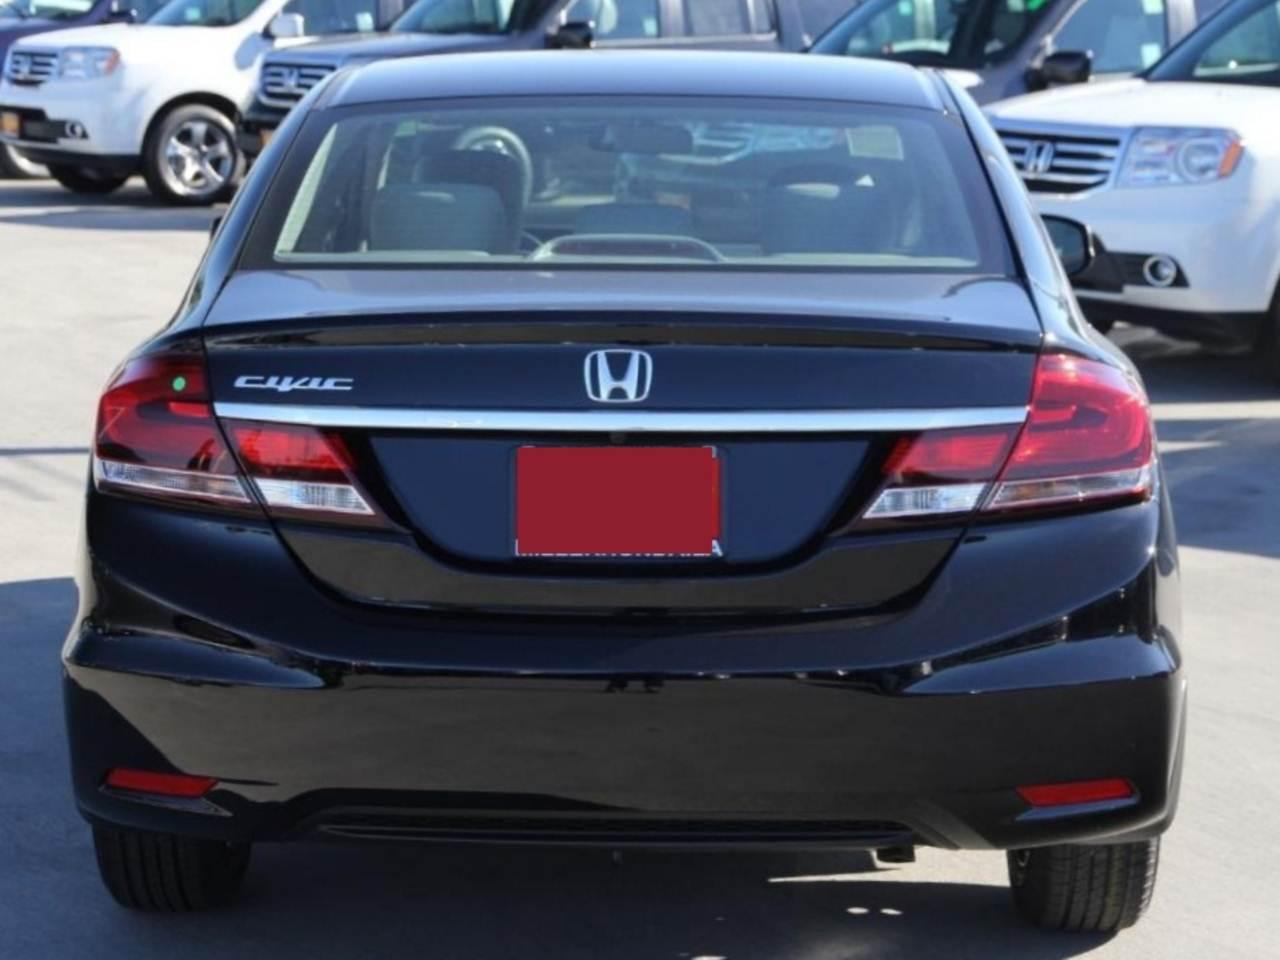 Honda Civic 8 High Resolution Car Wallpaper